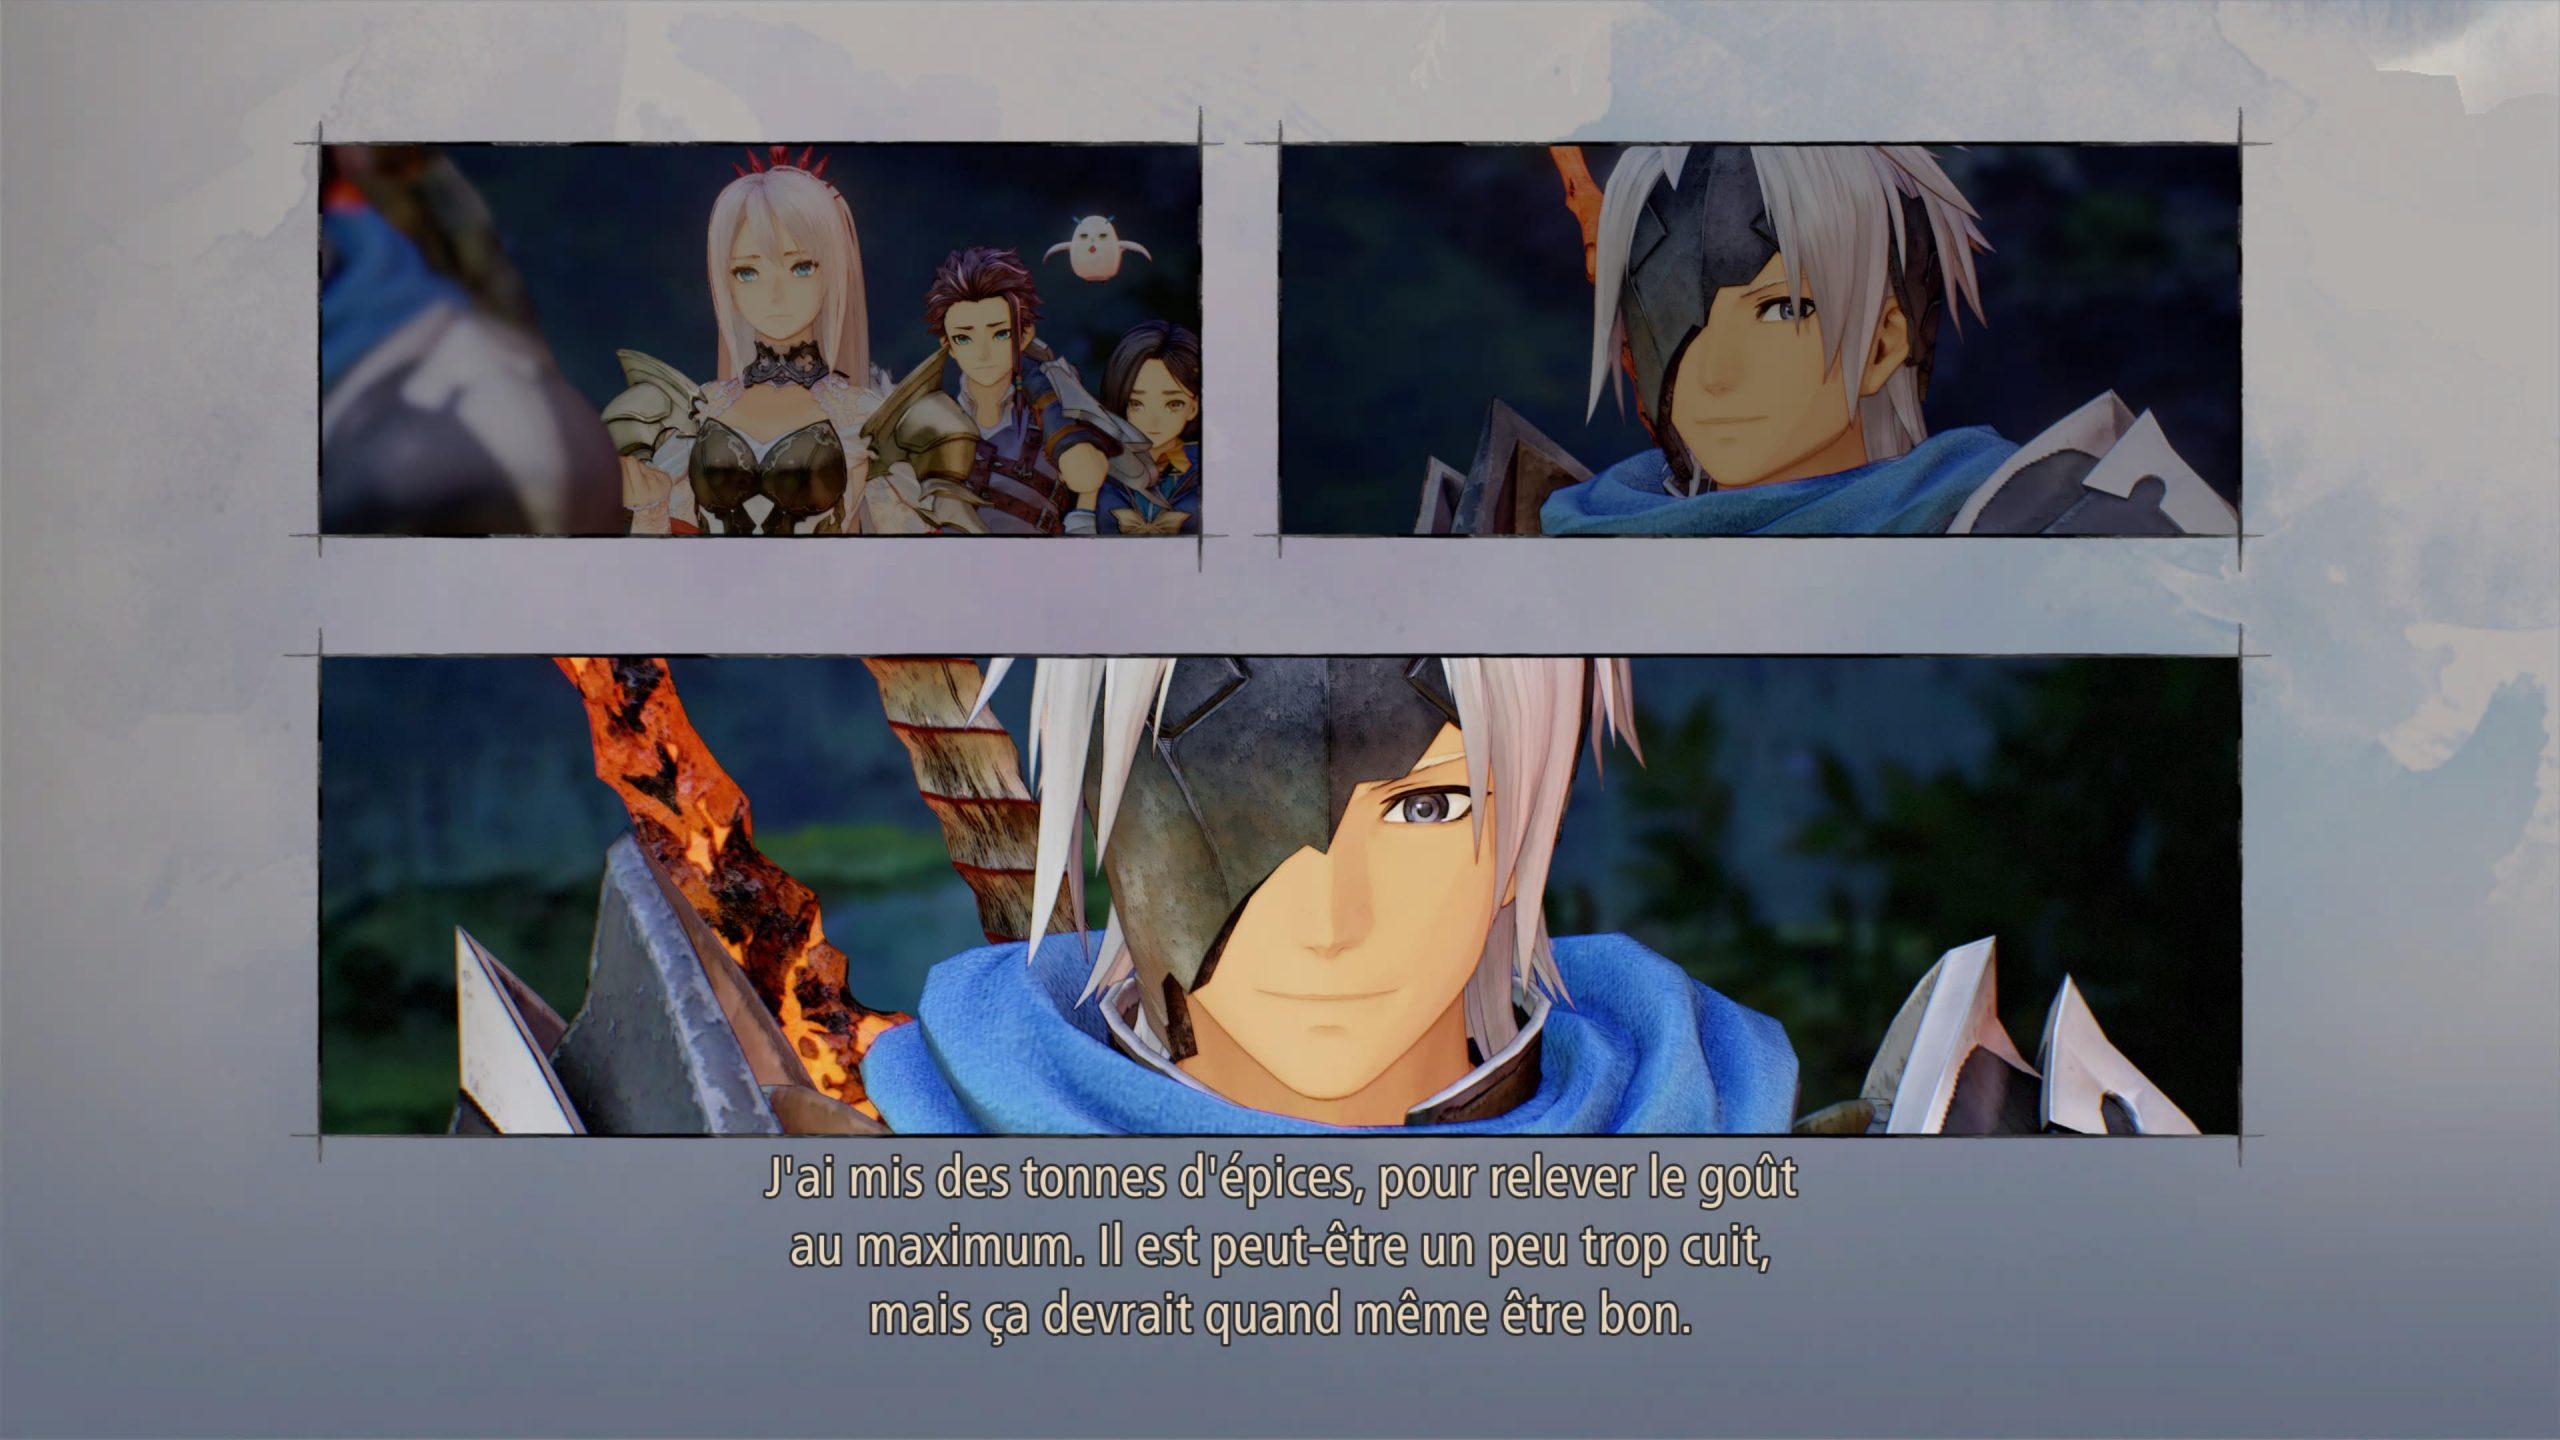 démo tales of arise screenshot démo ps5 histoire